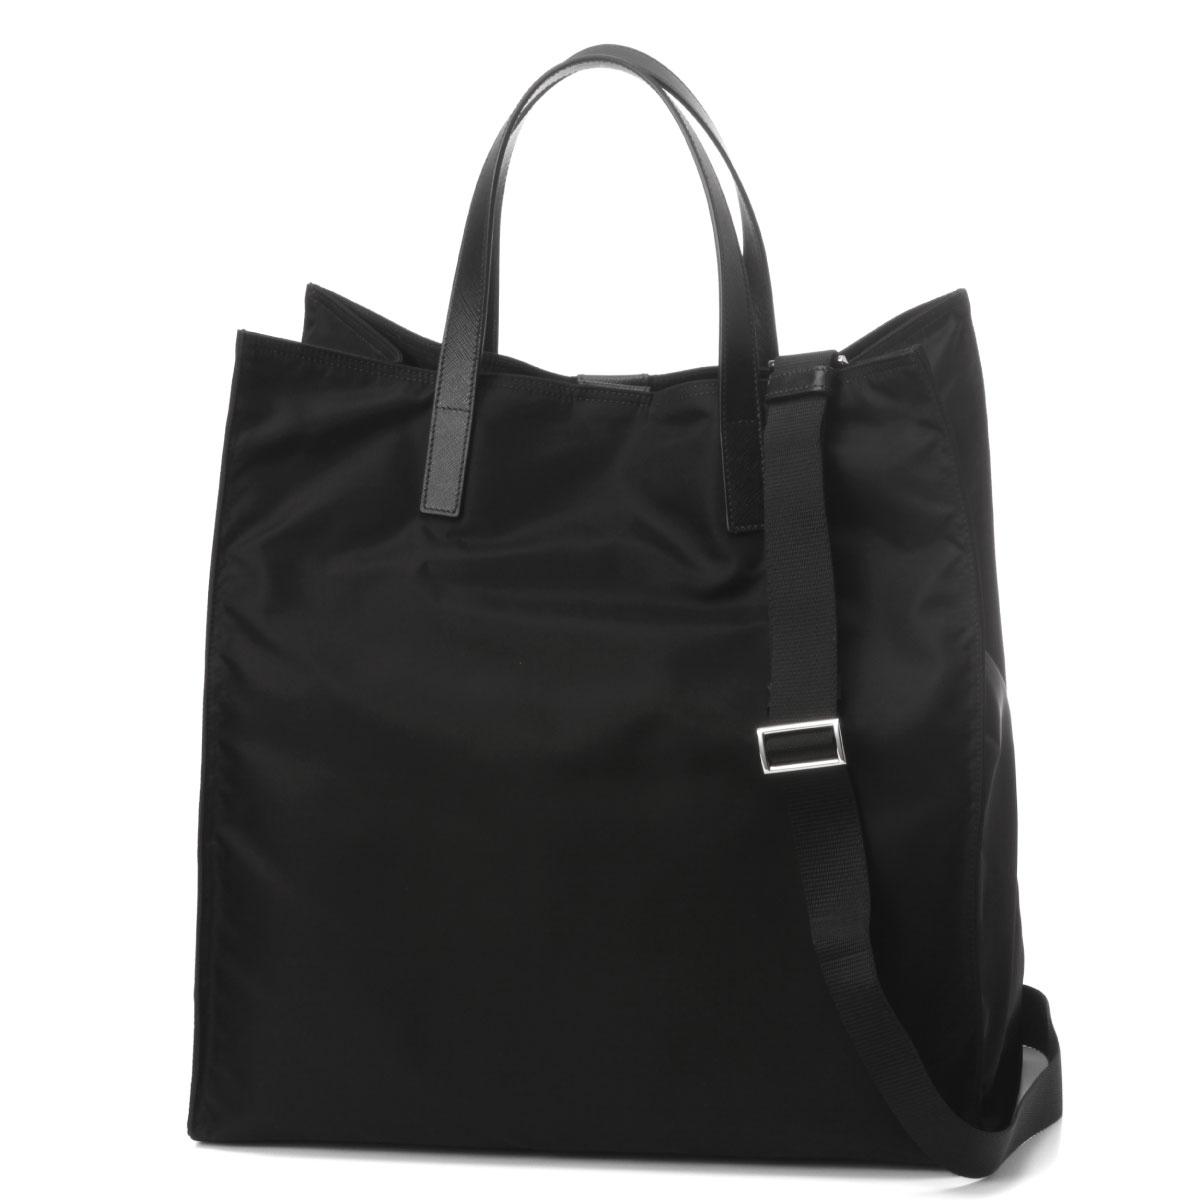 fee8639287 new arrivals prada prada bag men 2vg905 064 f0002 shoulder tote bag nero  black belonging to